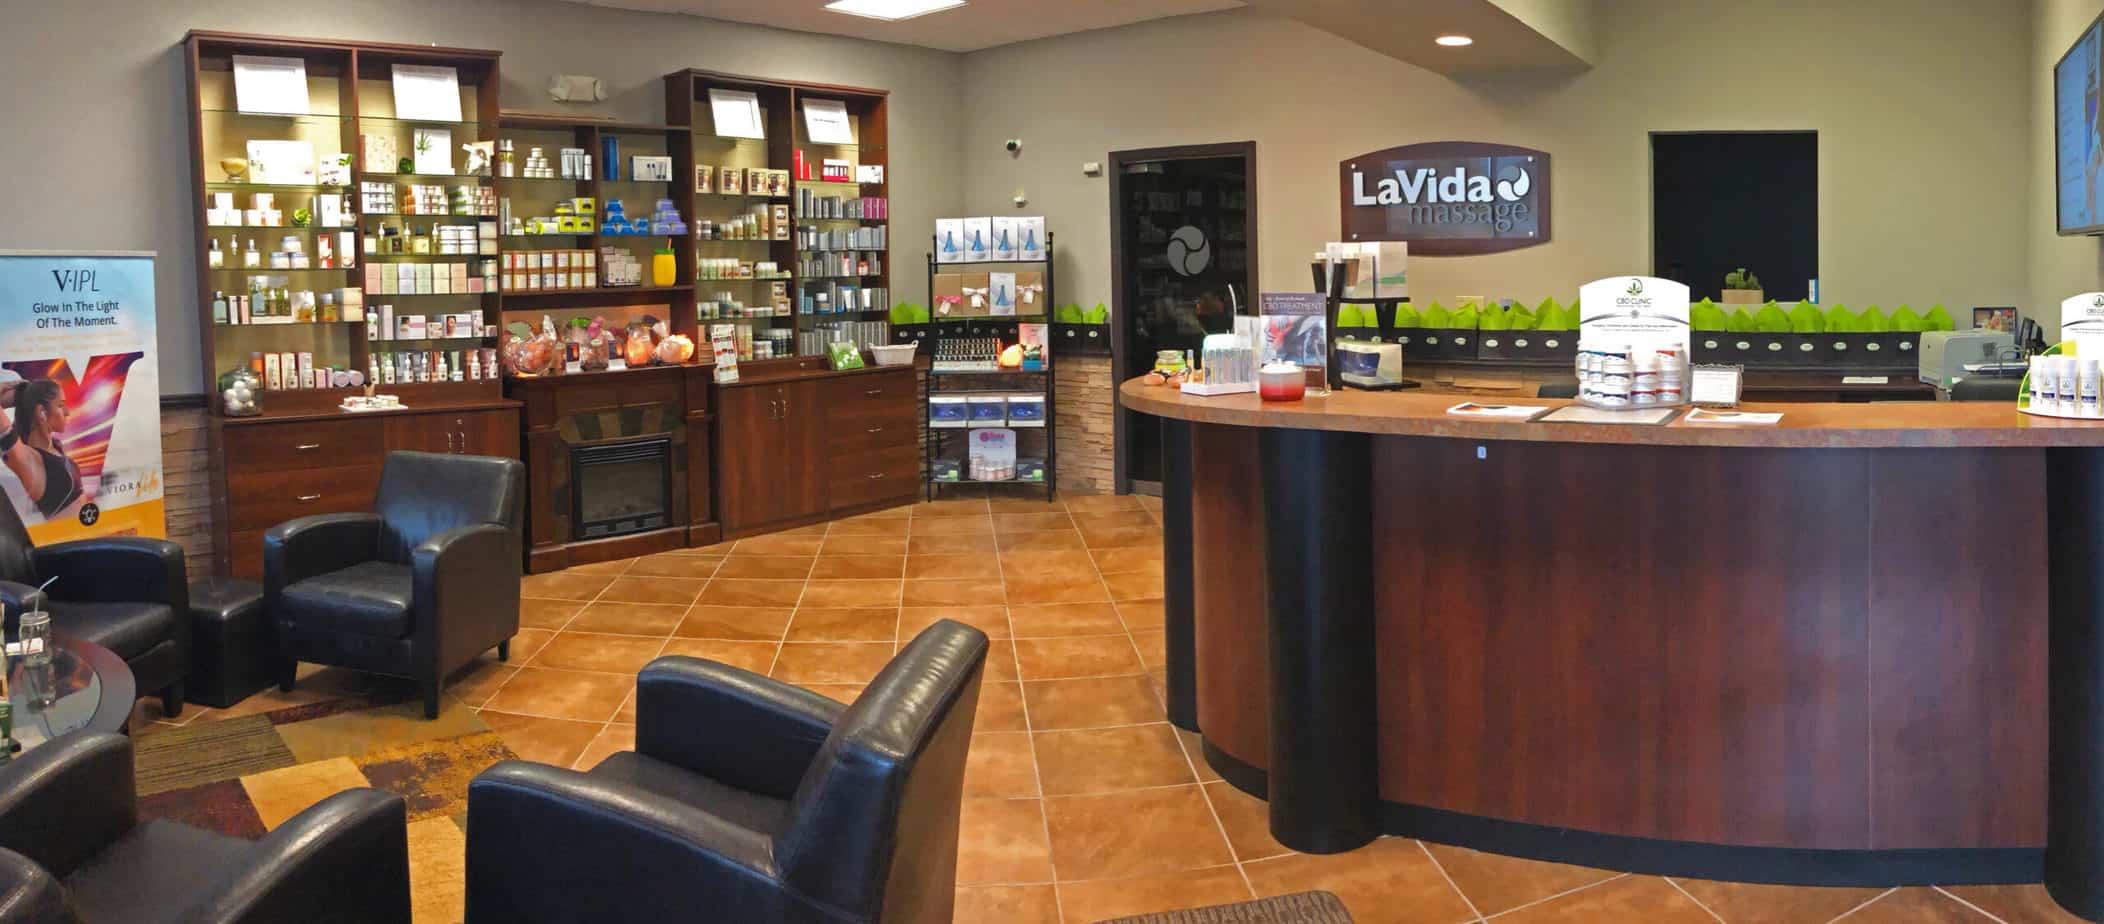 LaVida Massage of Smithtown, Lobby, Massage, Skincare, Hydrafacial, Photofacial, IPL, Hair Removal, Waxing, Ultrasonic, Microdermabrasion, Therapeutic Massage